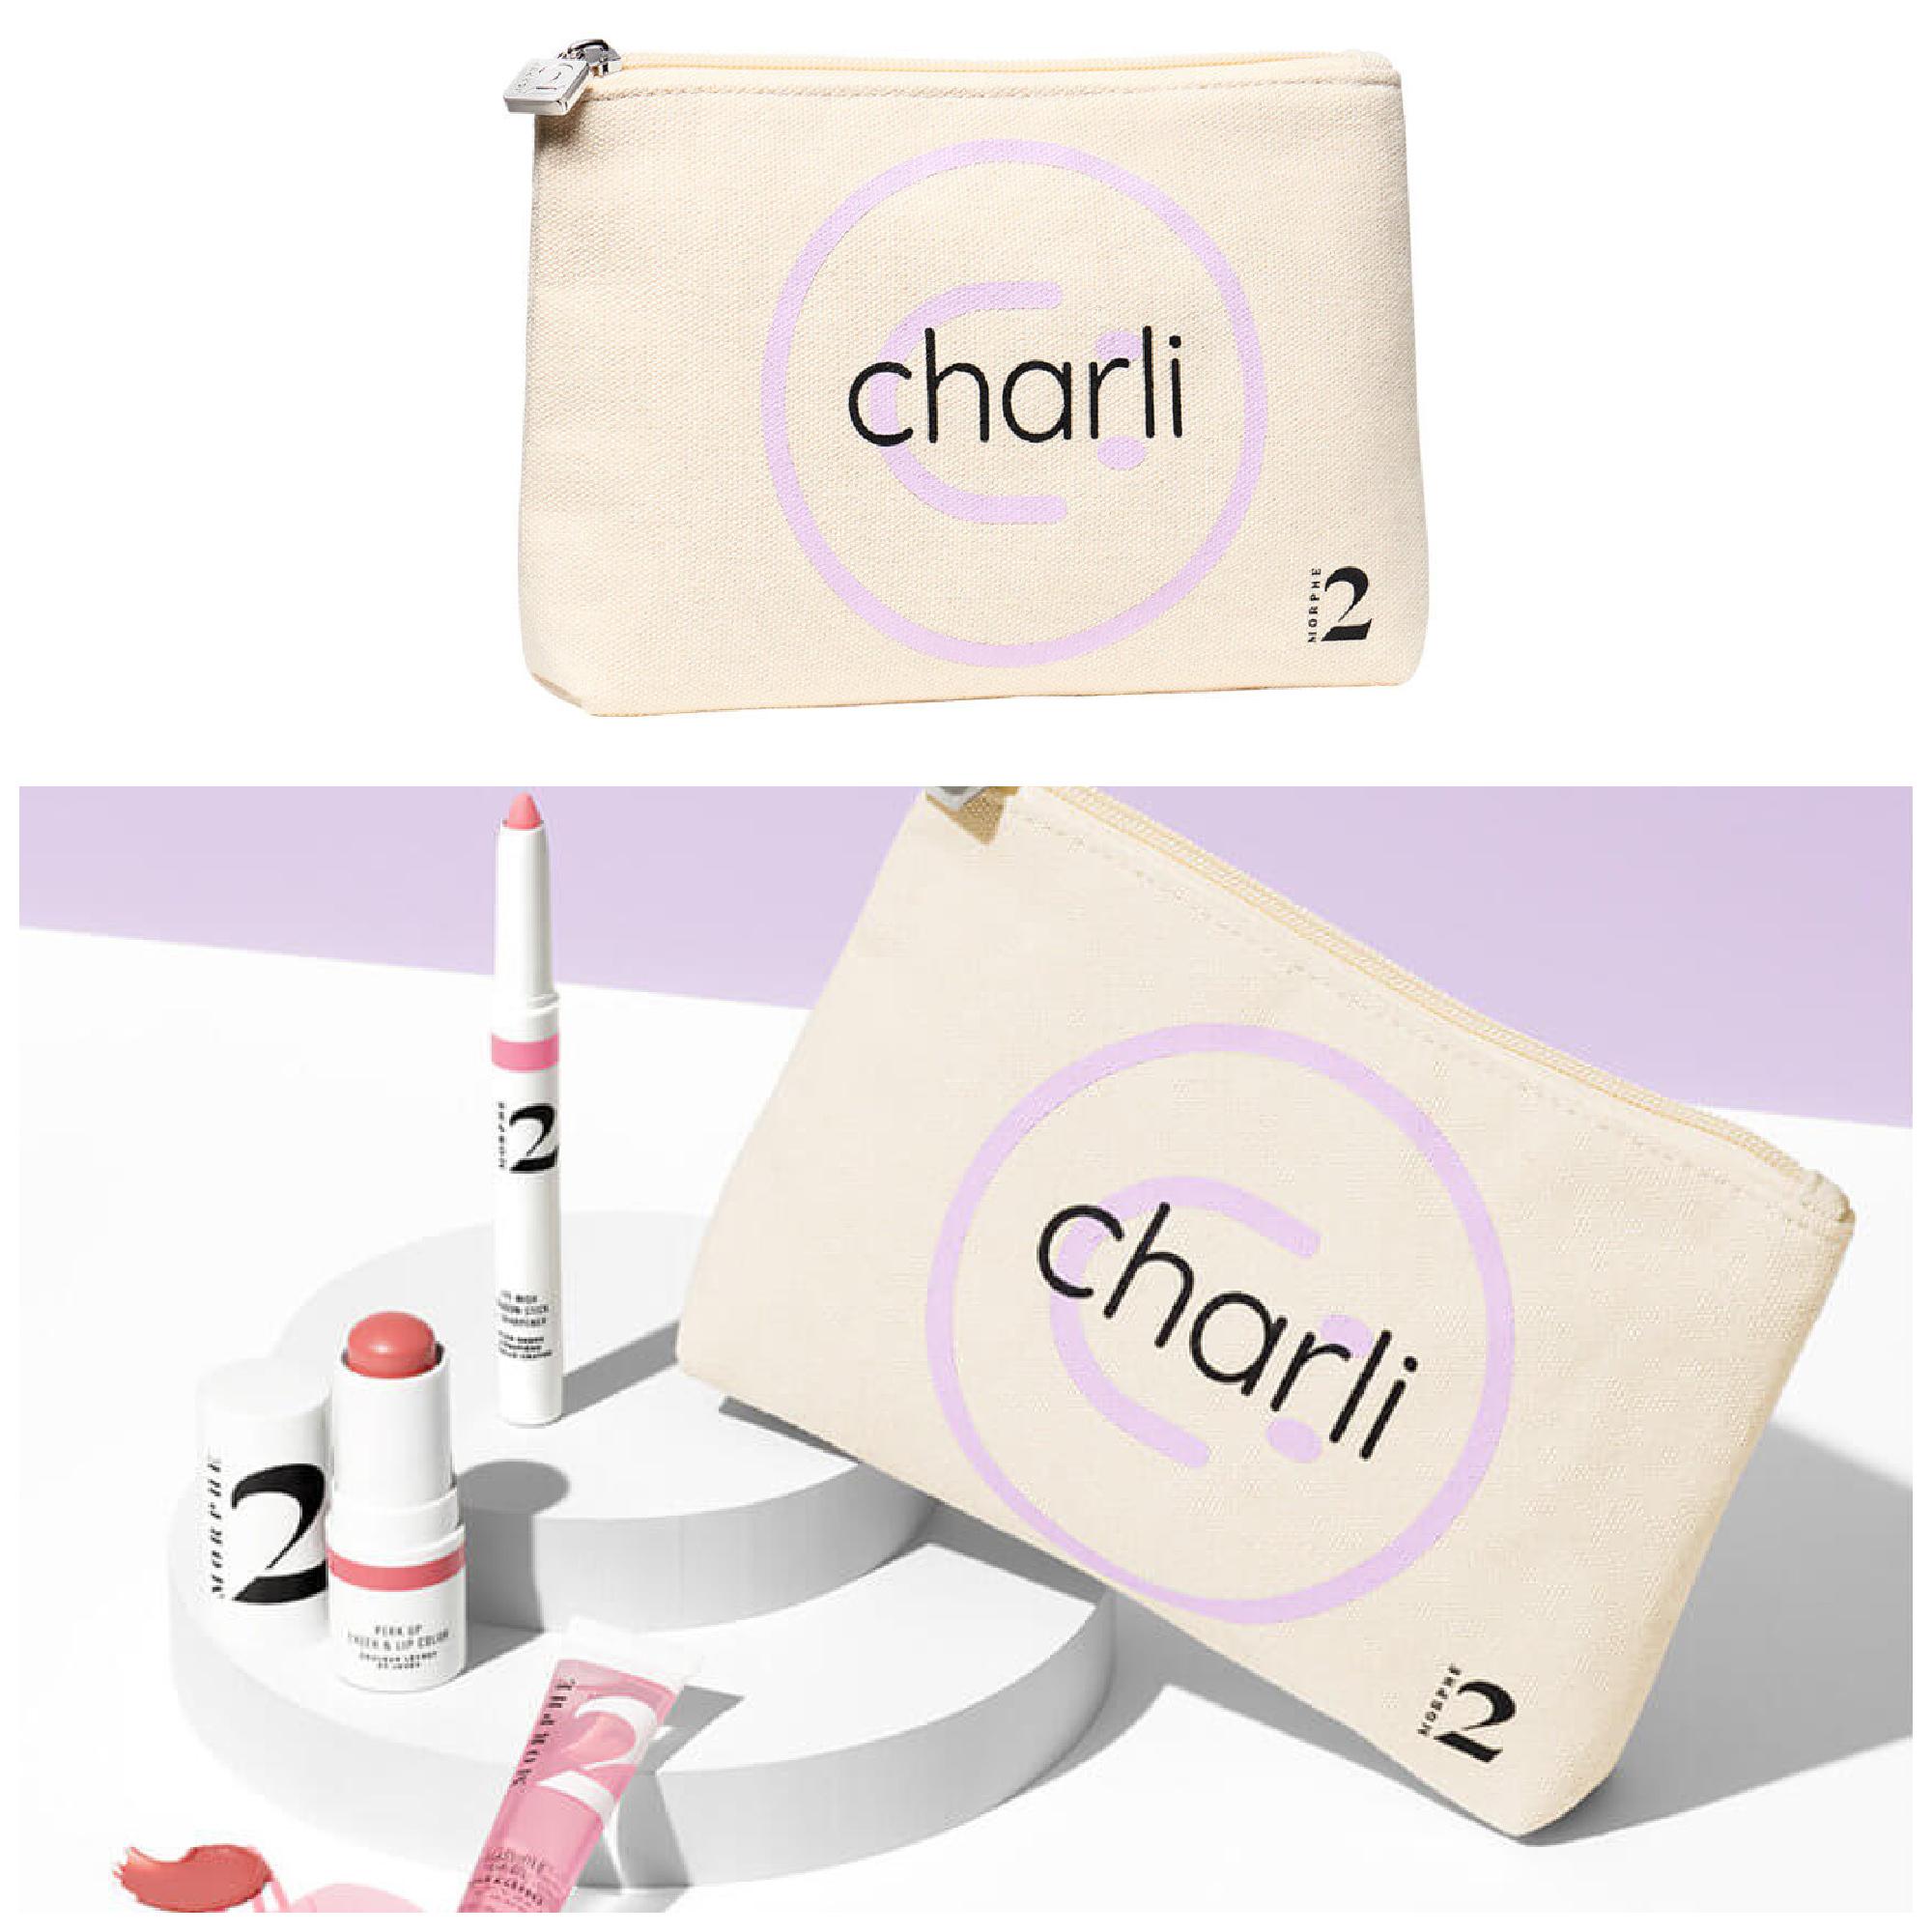 Morphe 2 Charli's Go-To Faves 3-Piece Makeup Set